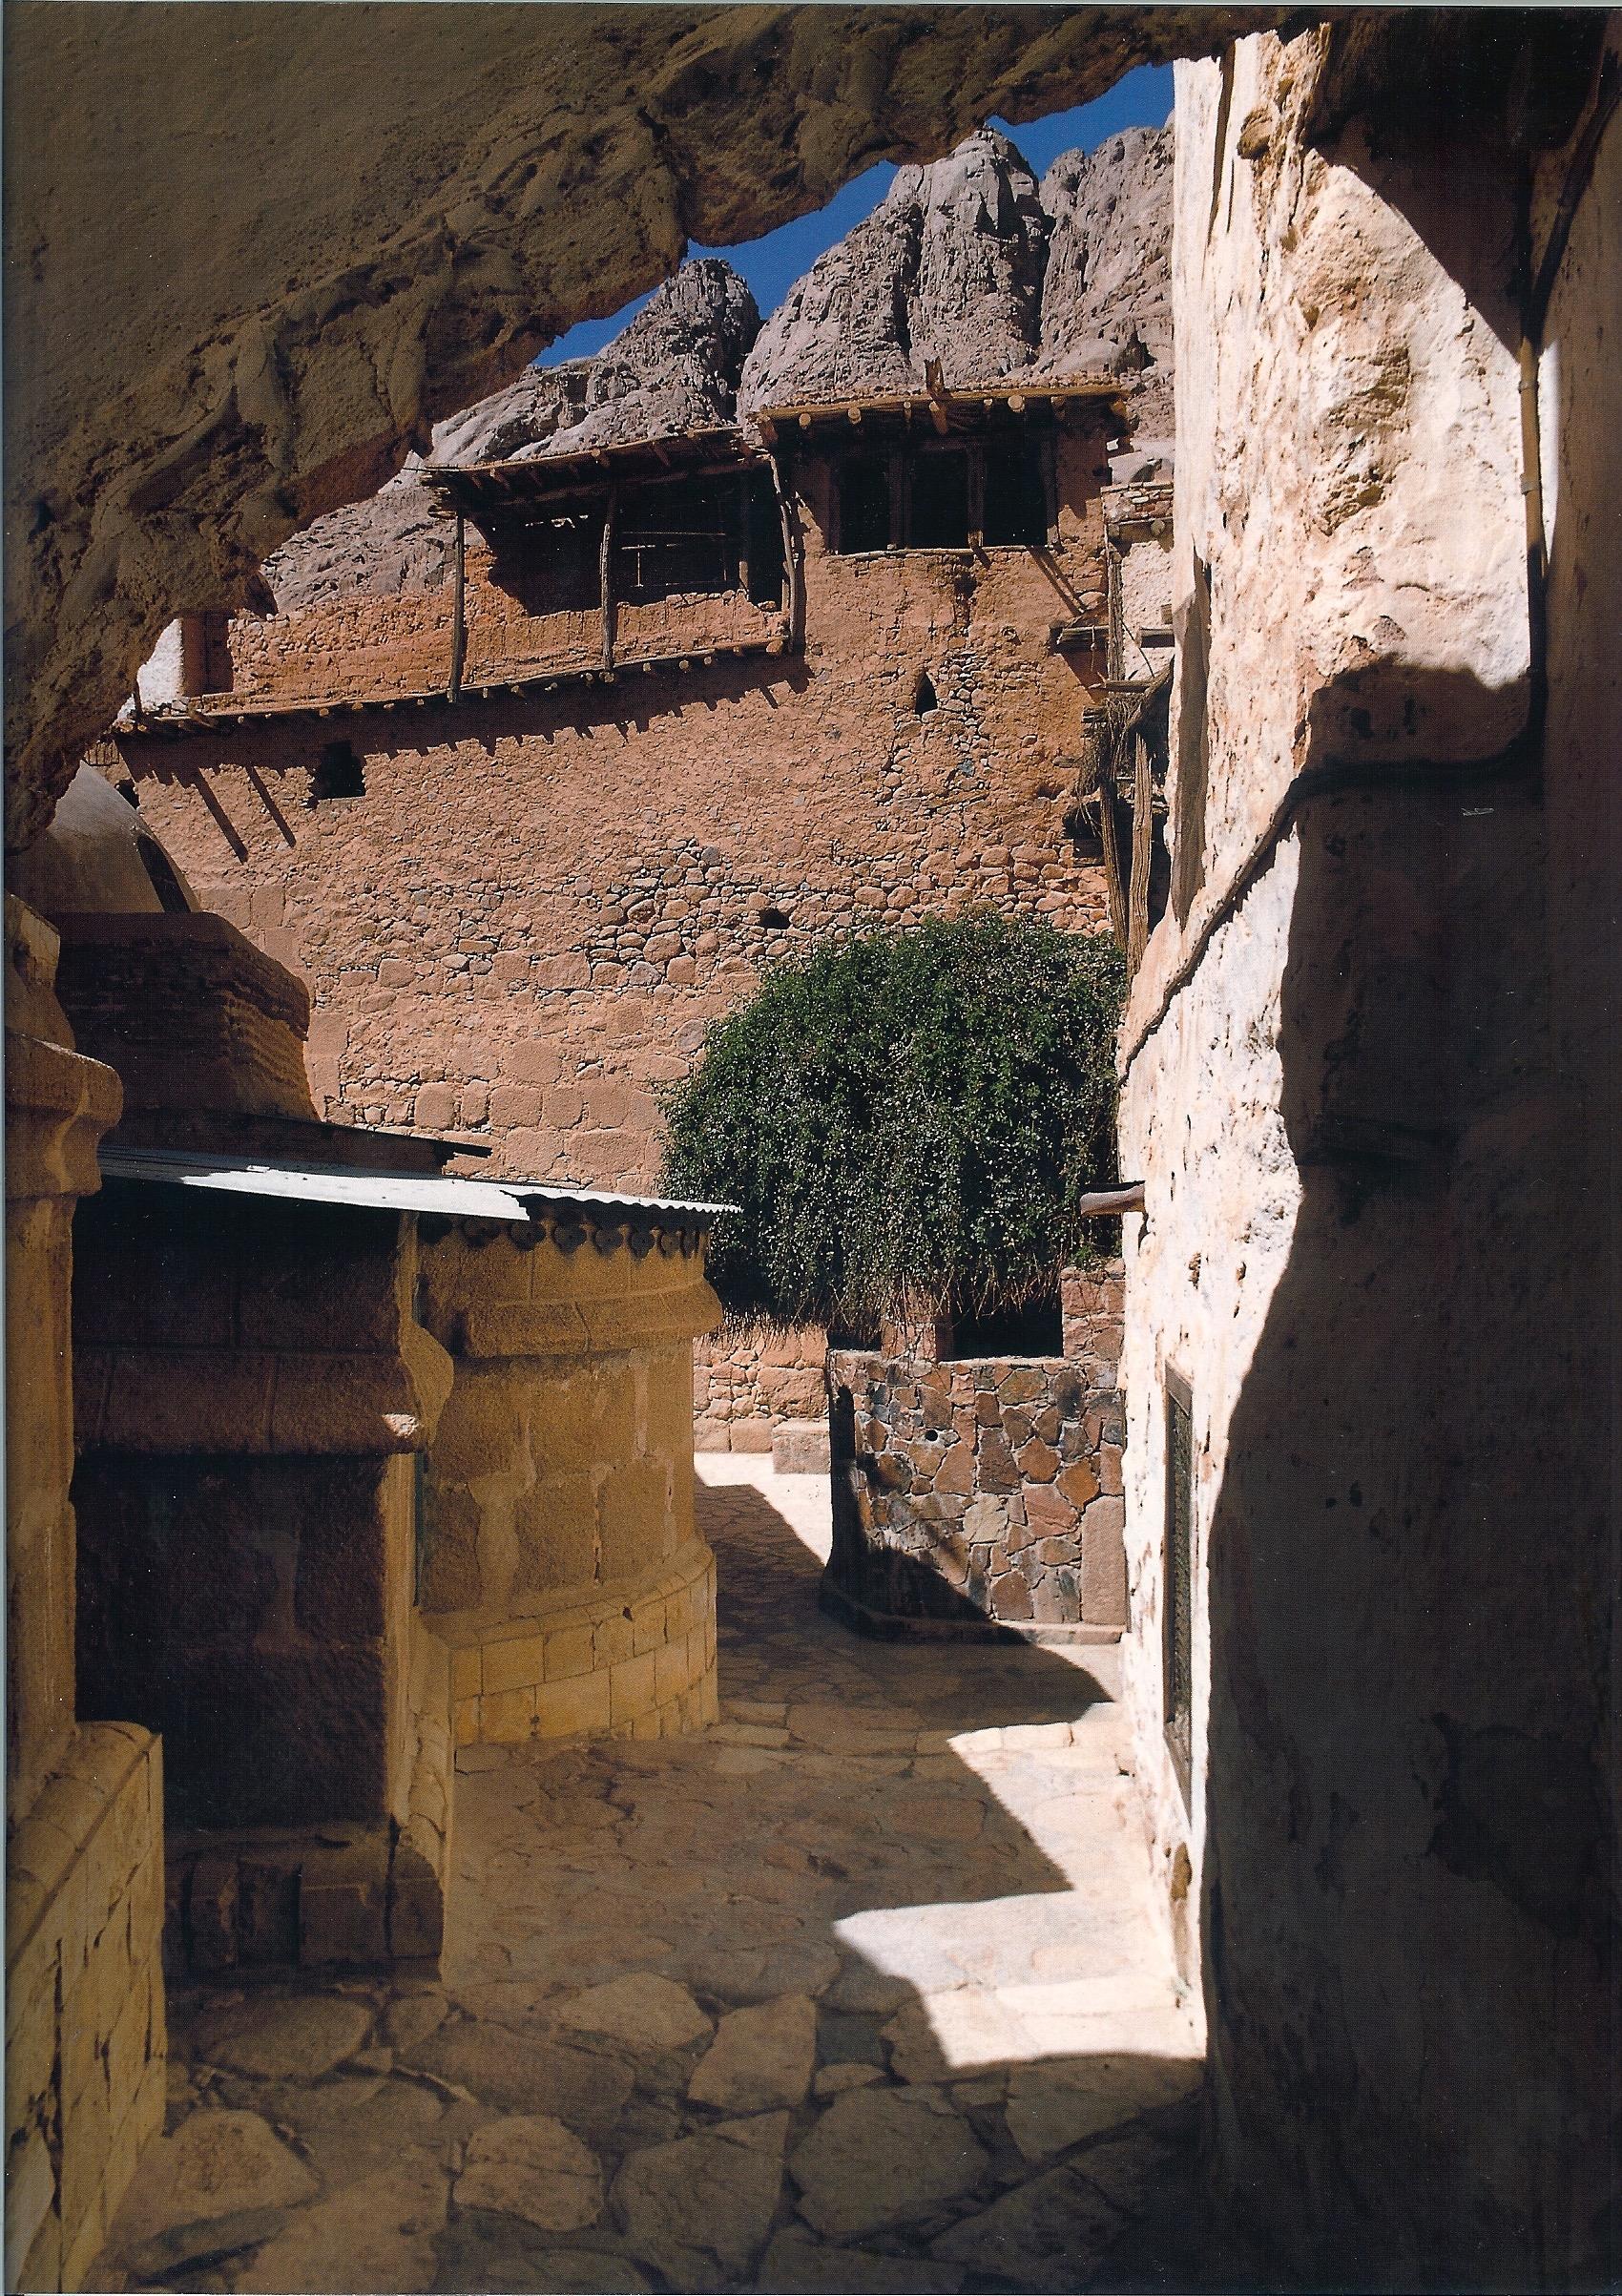 View of the Burning Bush at Saint Catherine's Monastery